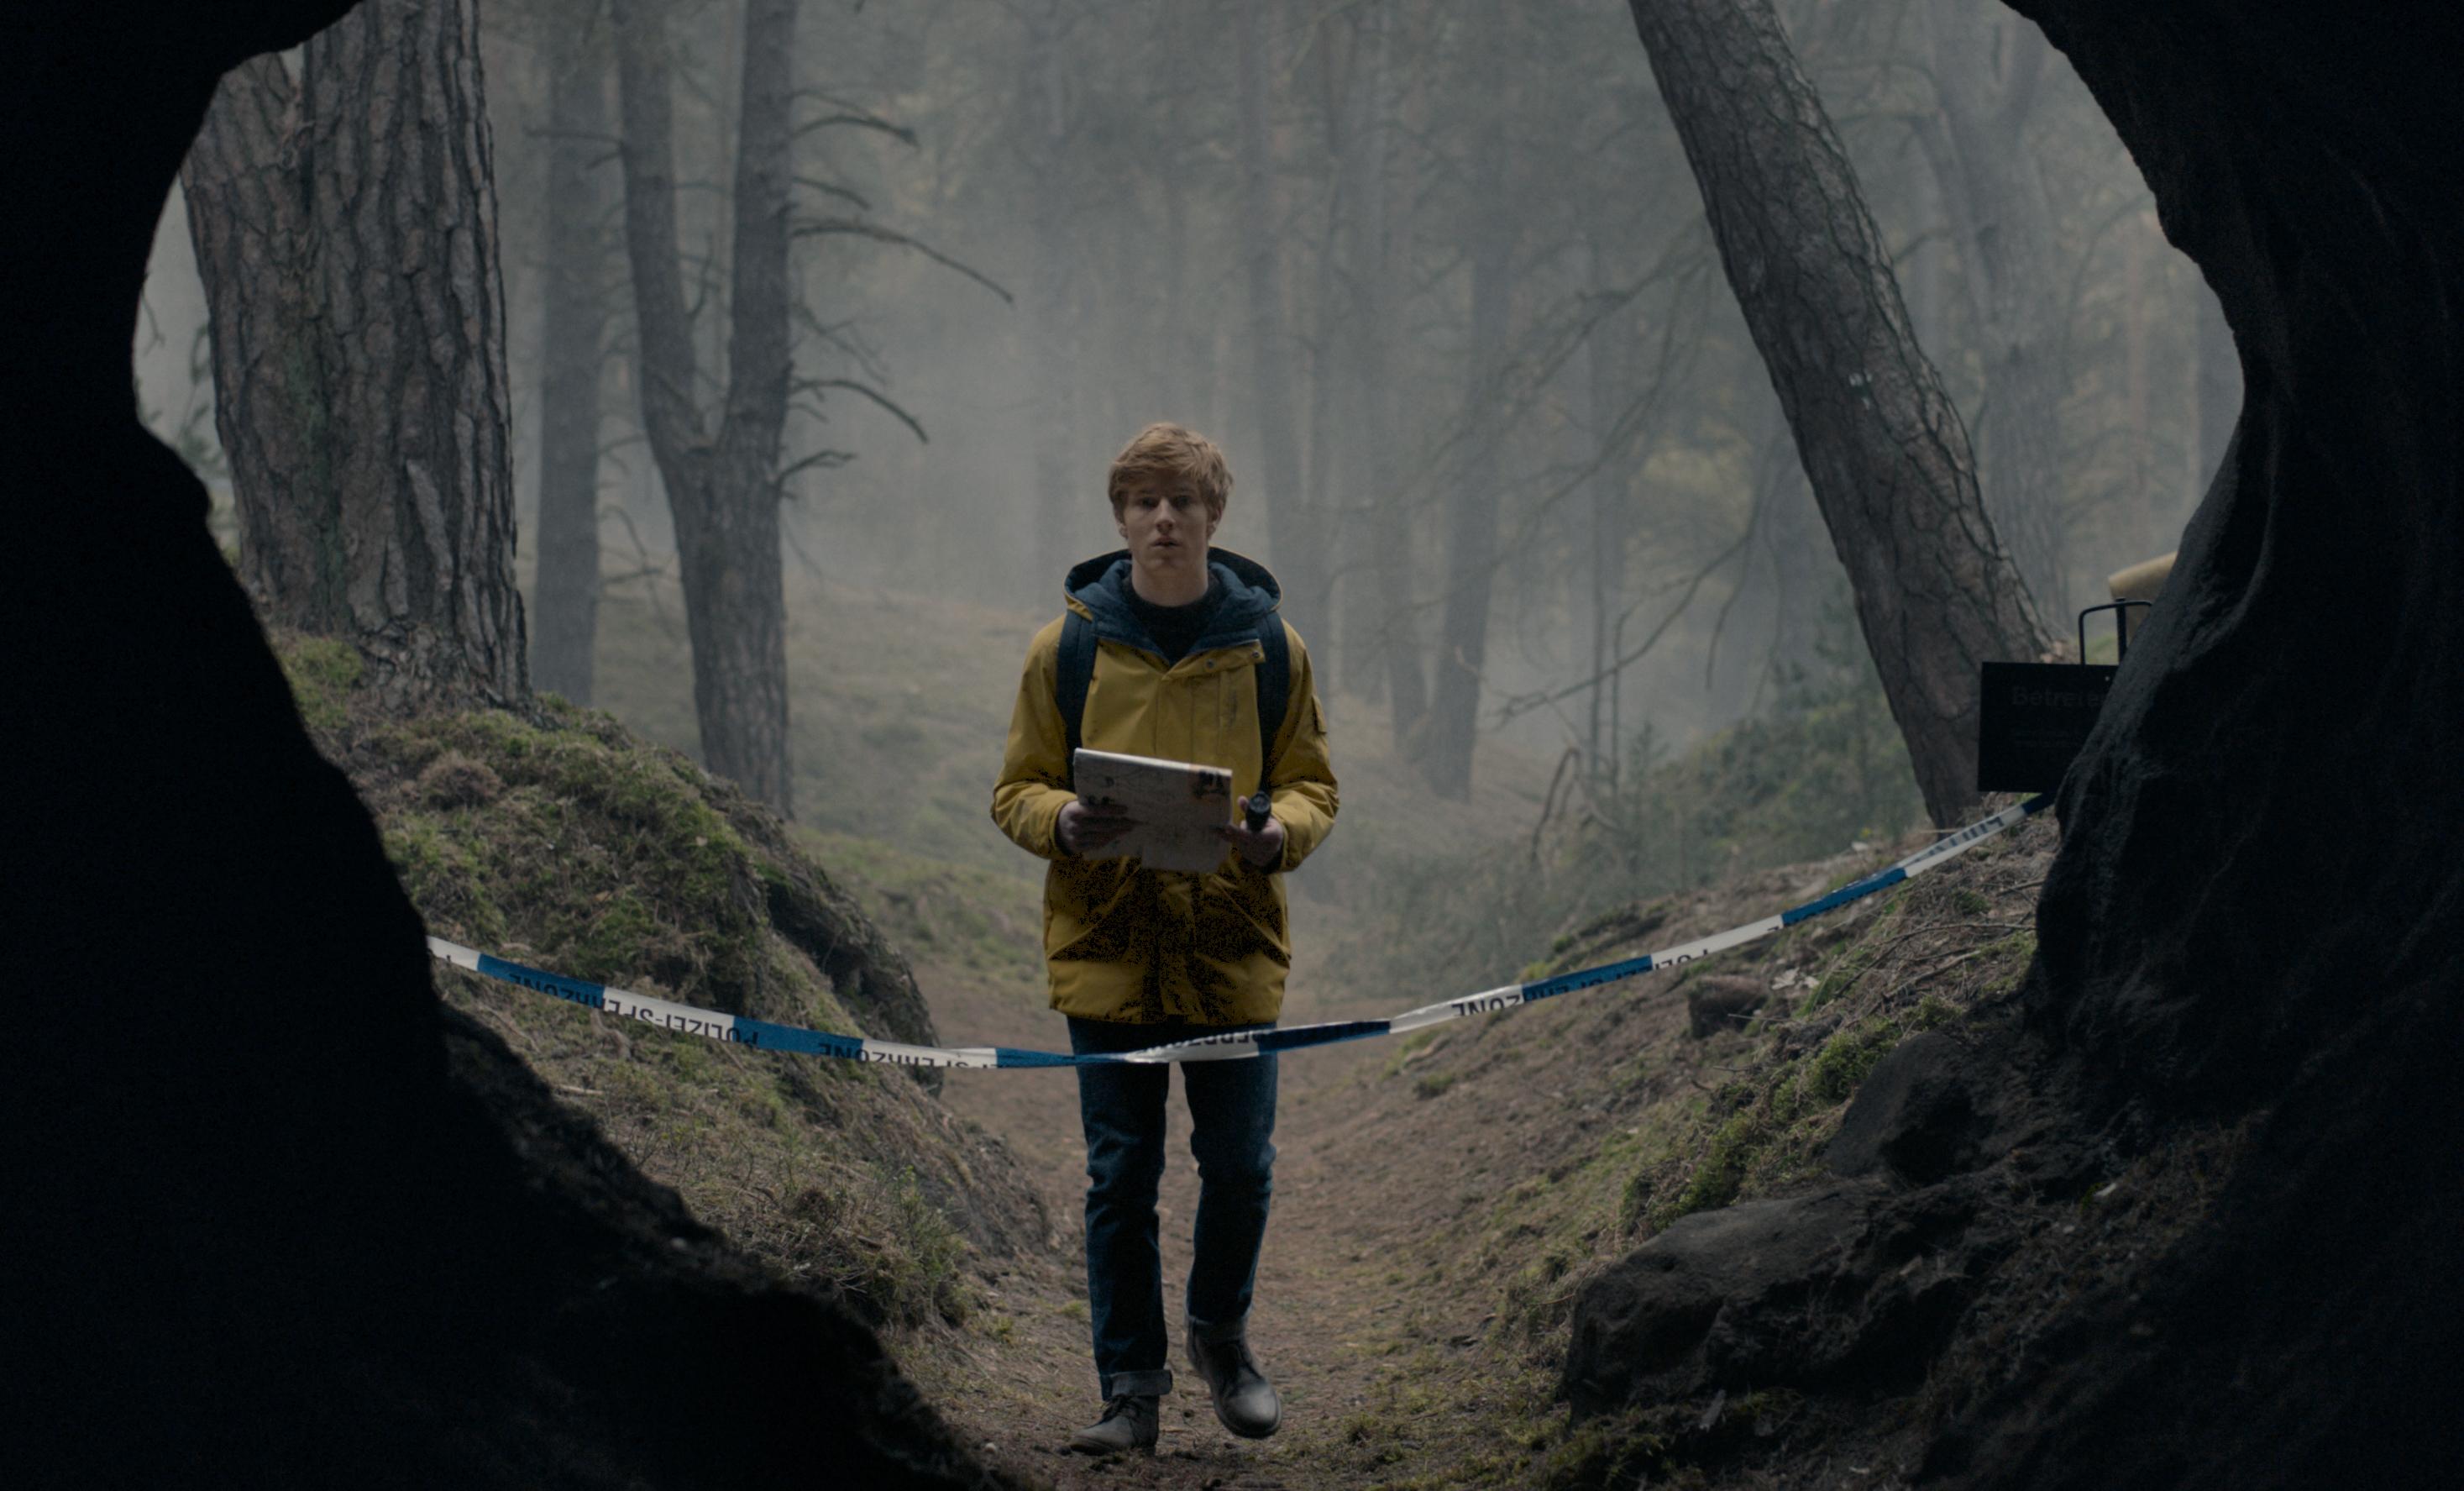 Dark segunda temporada